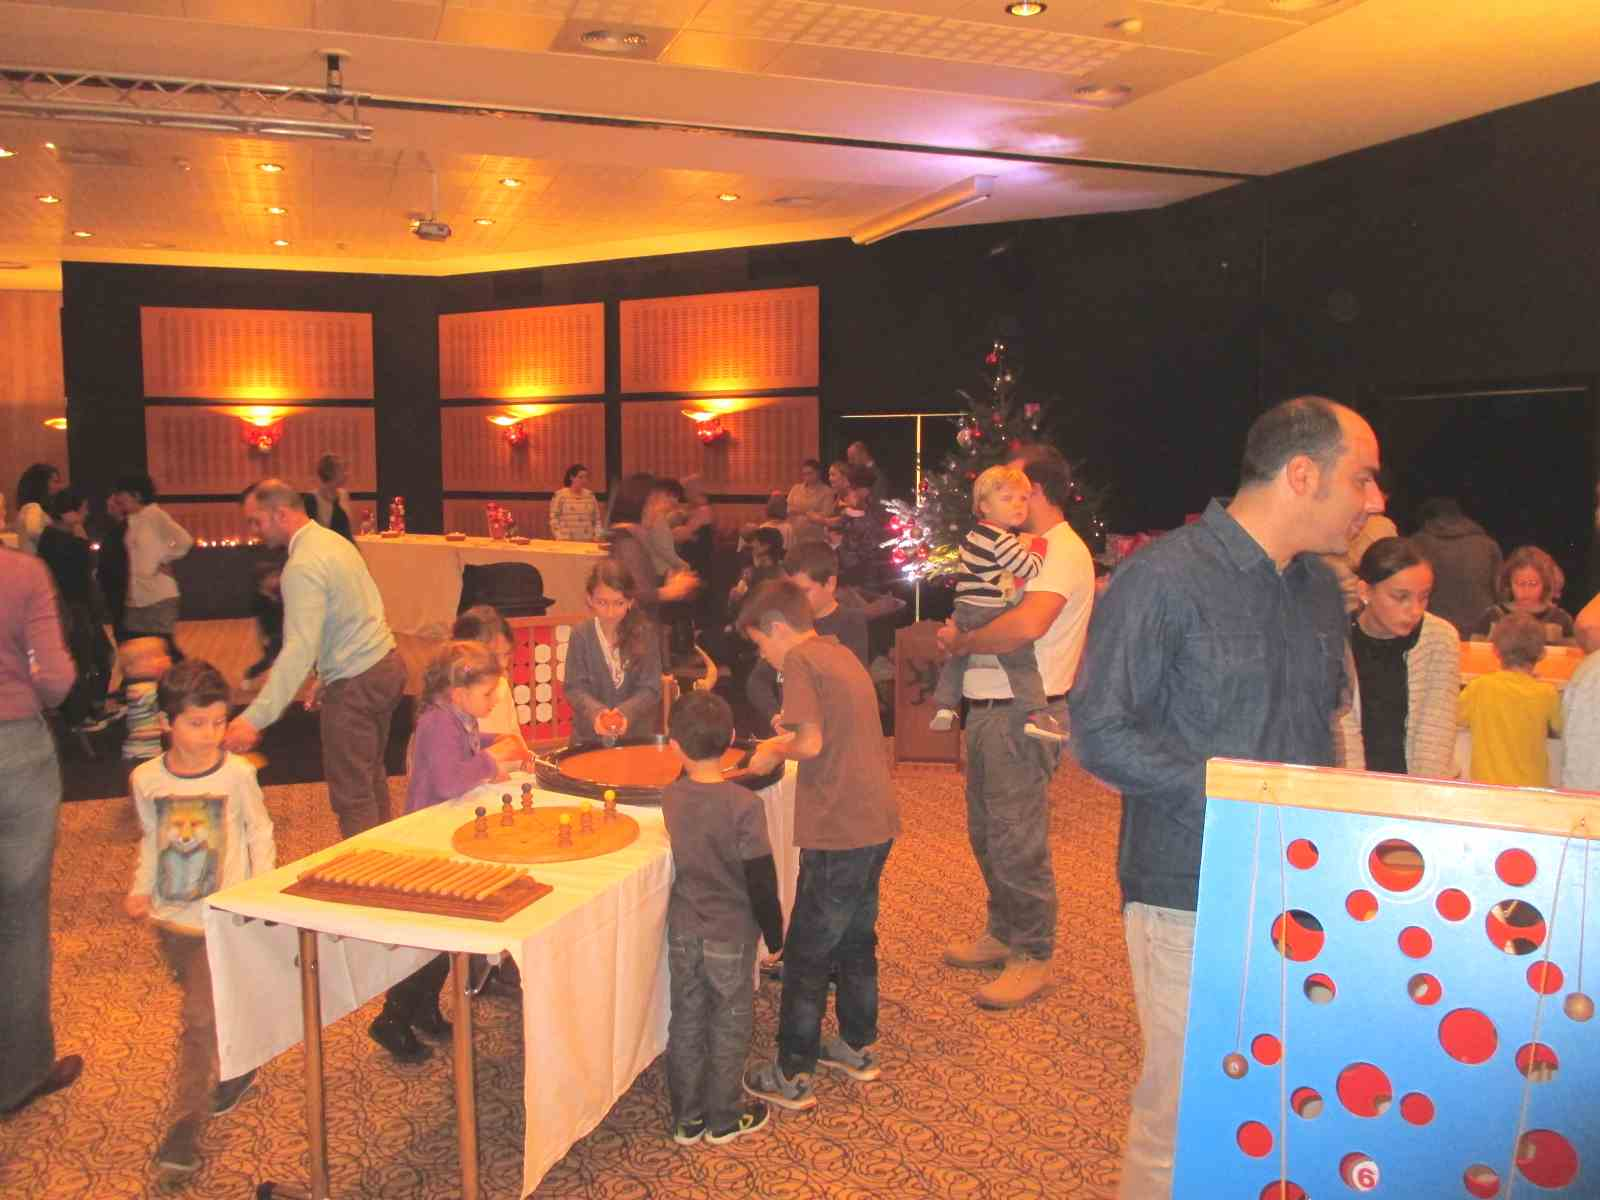 Jeux_Basque_Noel